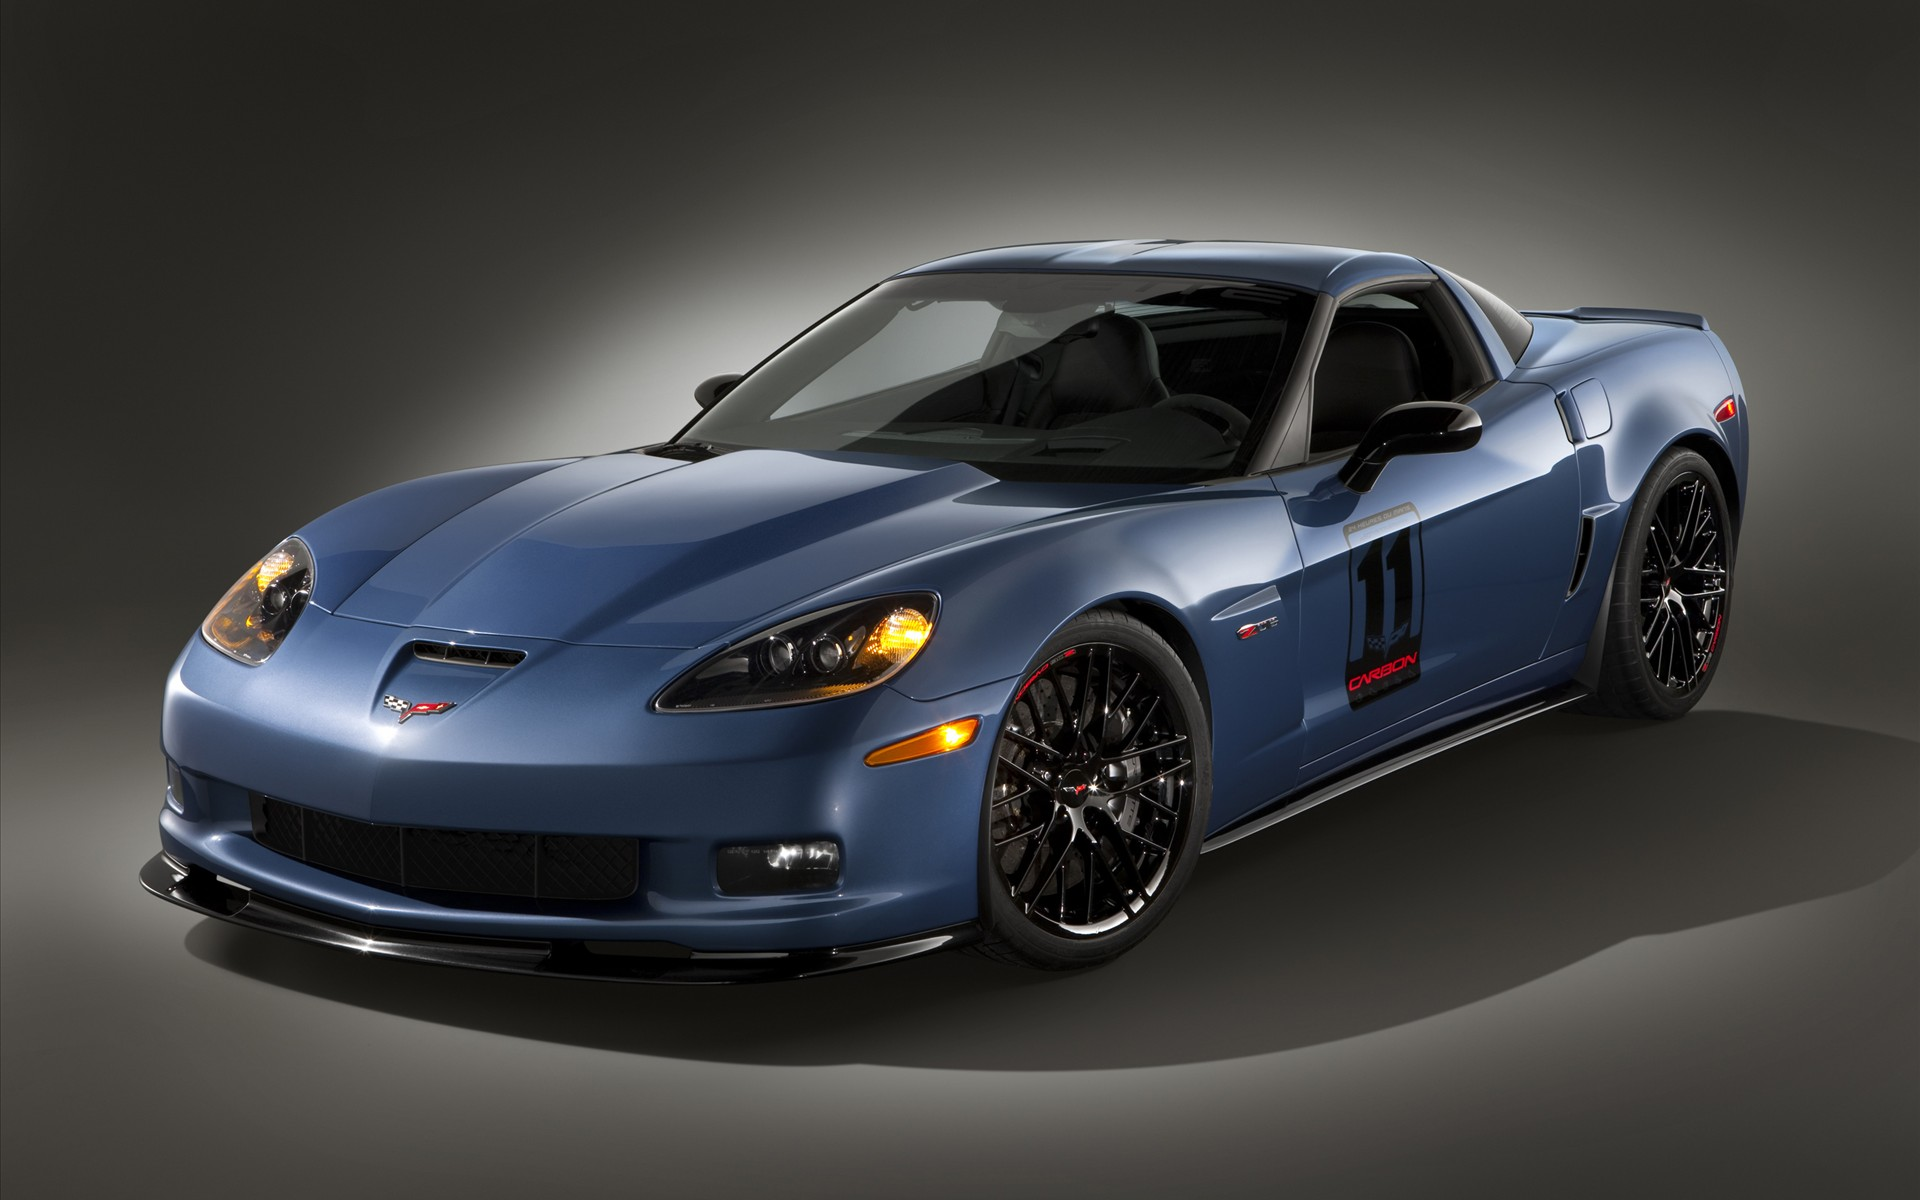 2011 Corvette Z06 Carbon Wallpapers HD Wallpapers 1920x1200